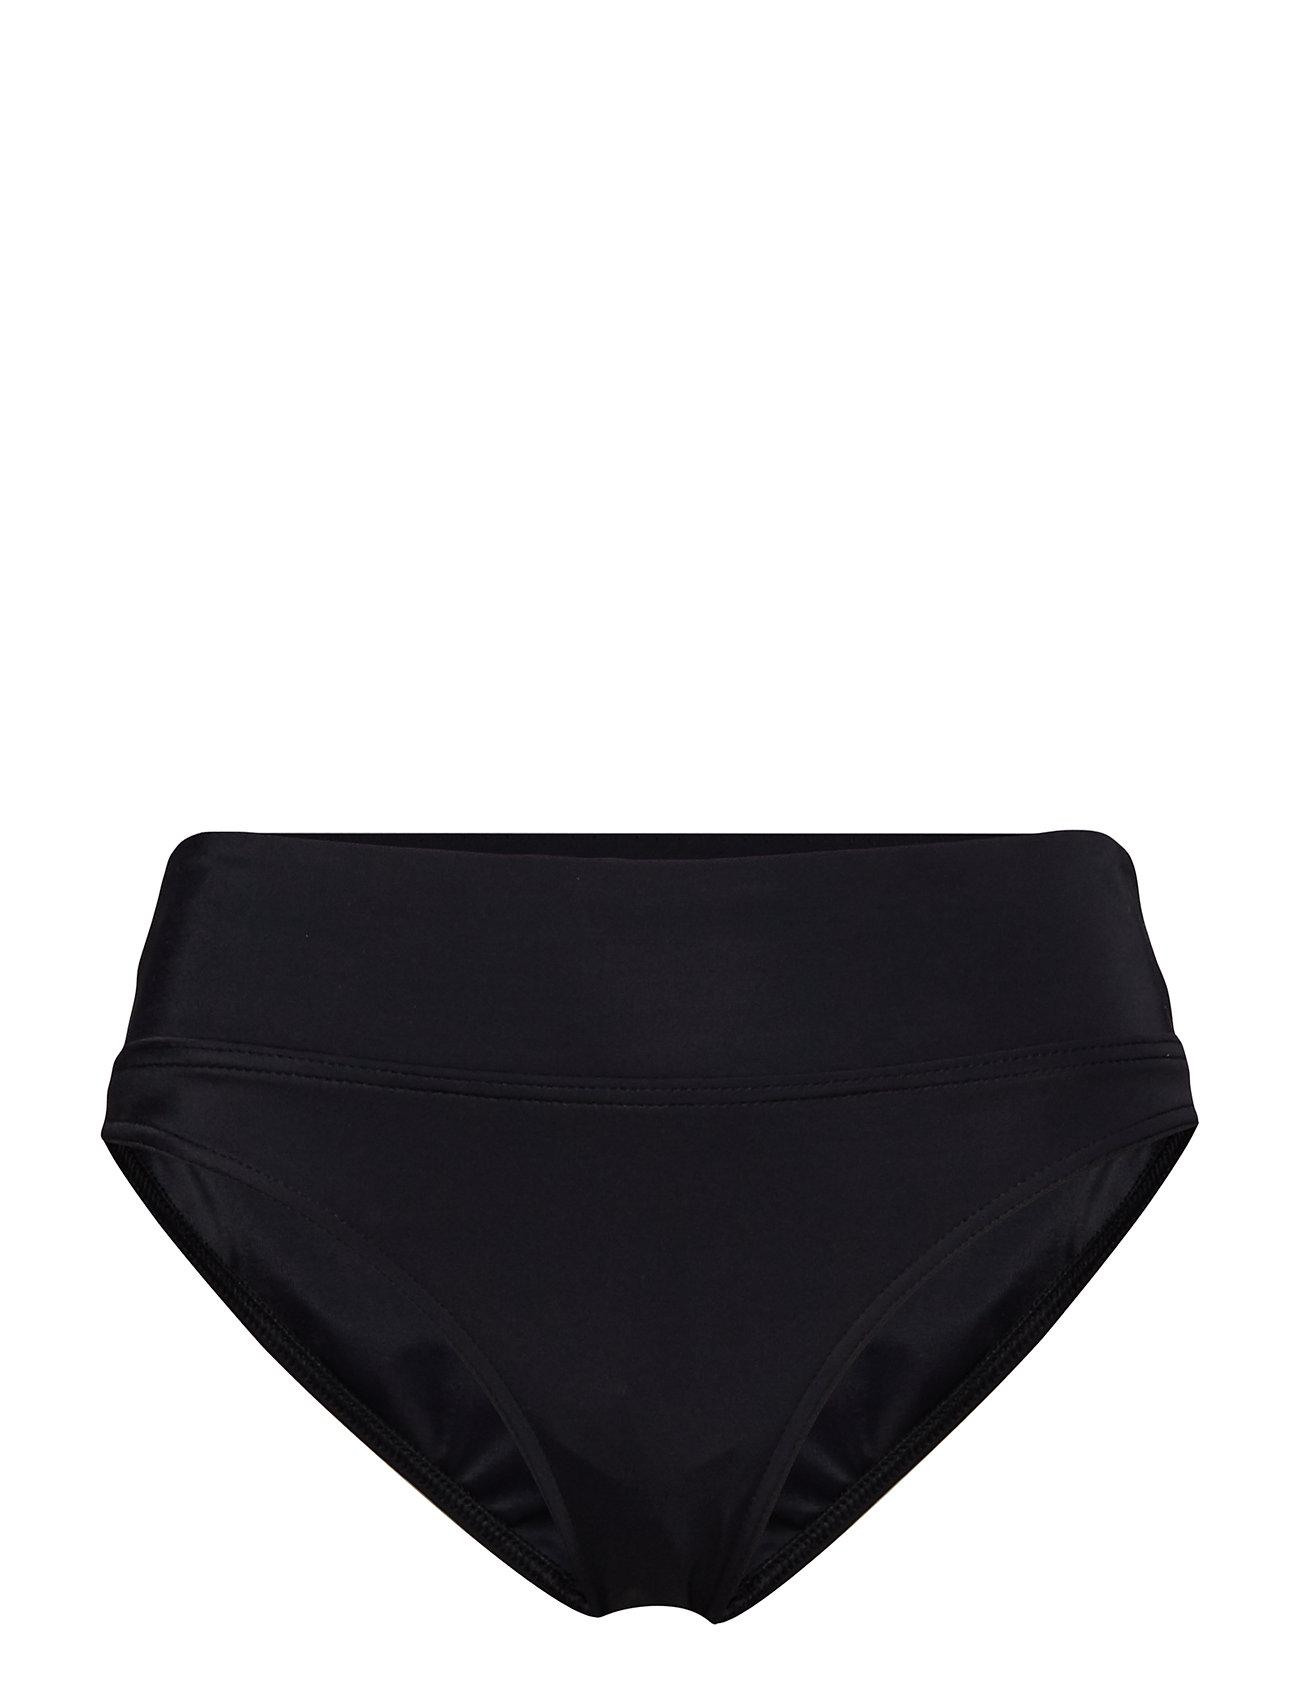 Waterwear Hansen BottomblackHelly Bikini W W BottomblackHelly Waterwear Bikini QrBExCWdoe